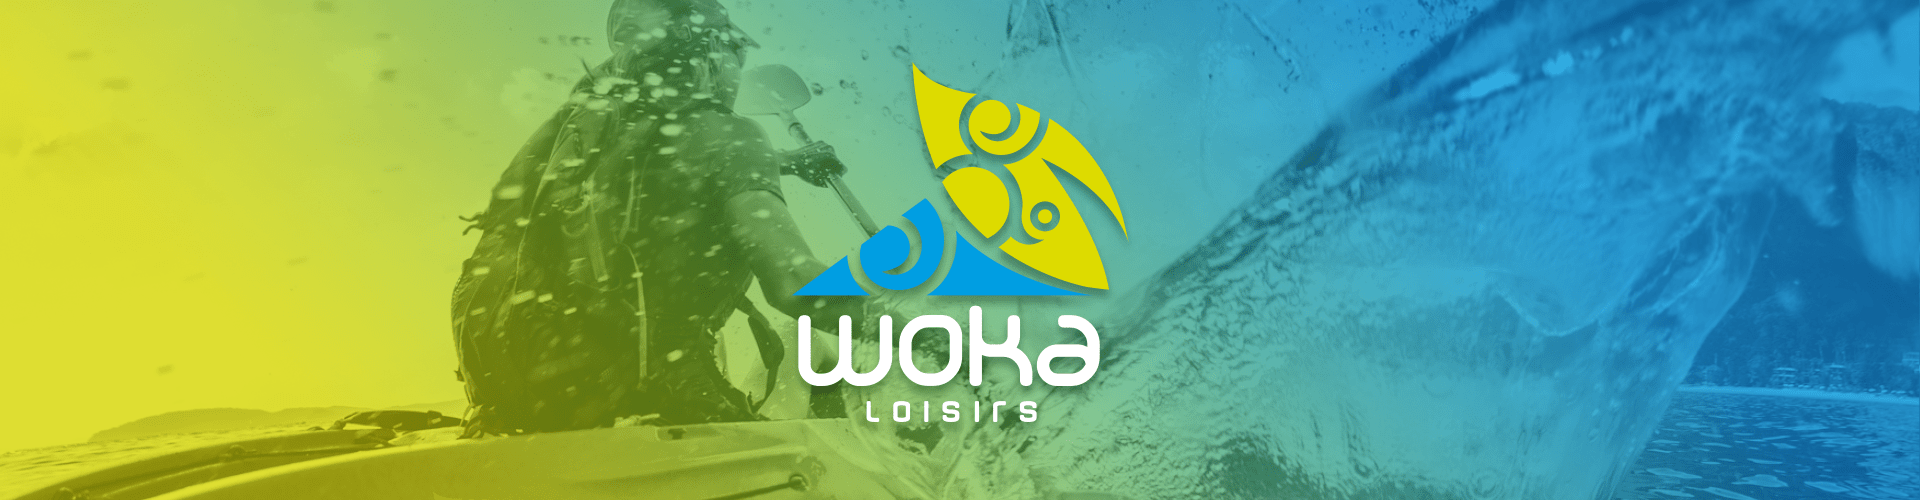 Woka loisirs - Conditions de ventes